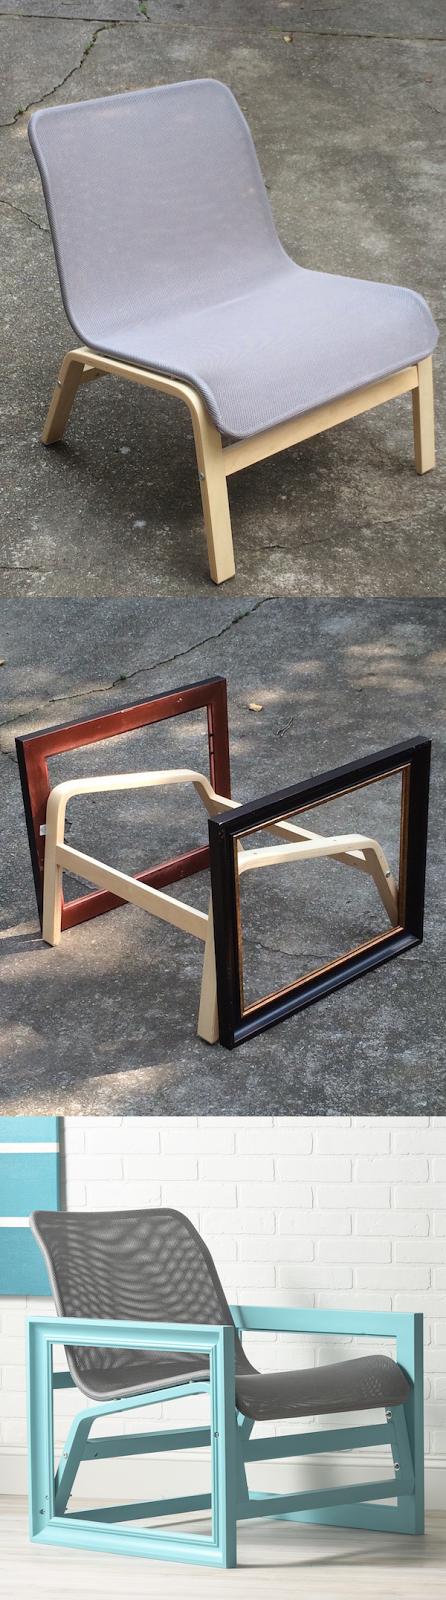 24 IKEA HACK Photo Frame Chair 600x2154 simphome com